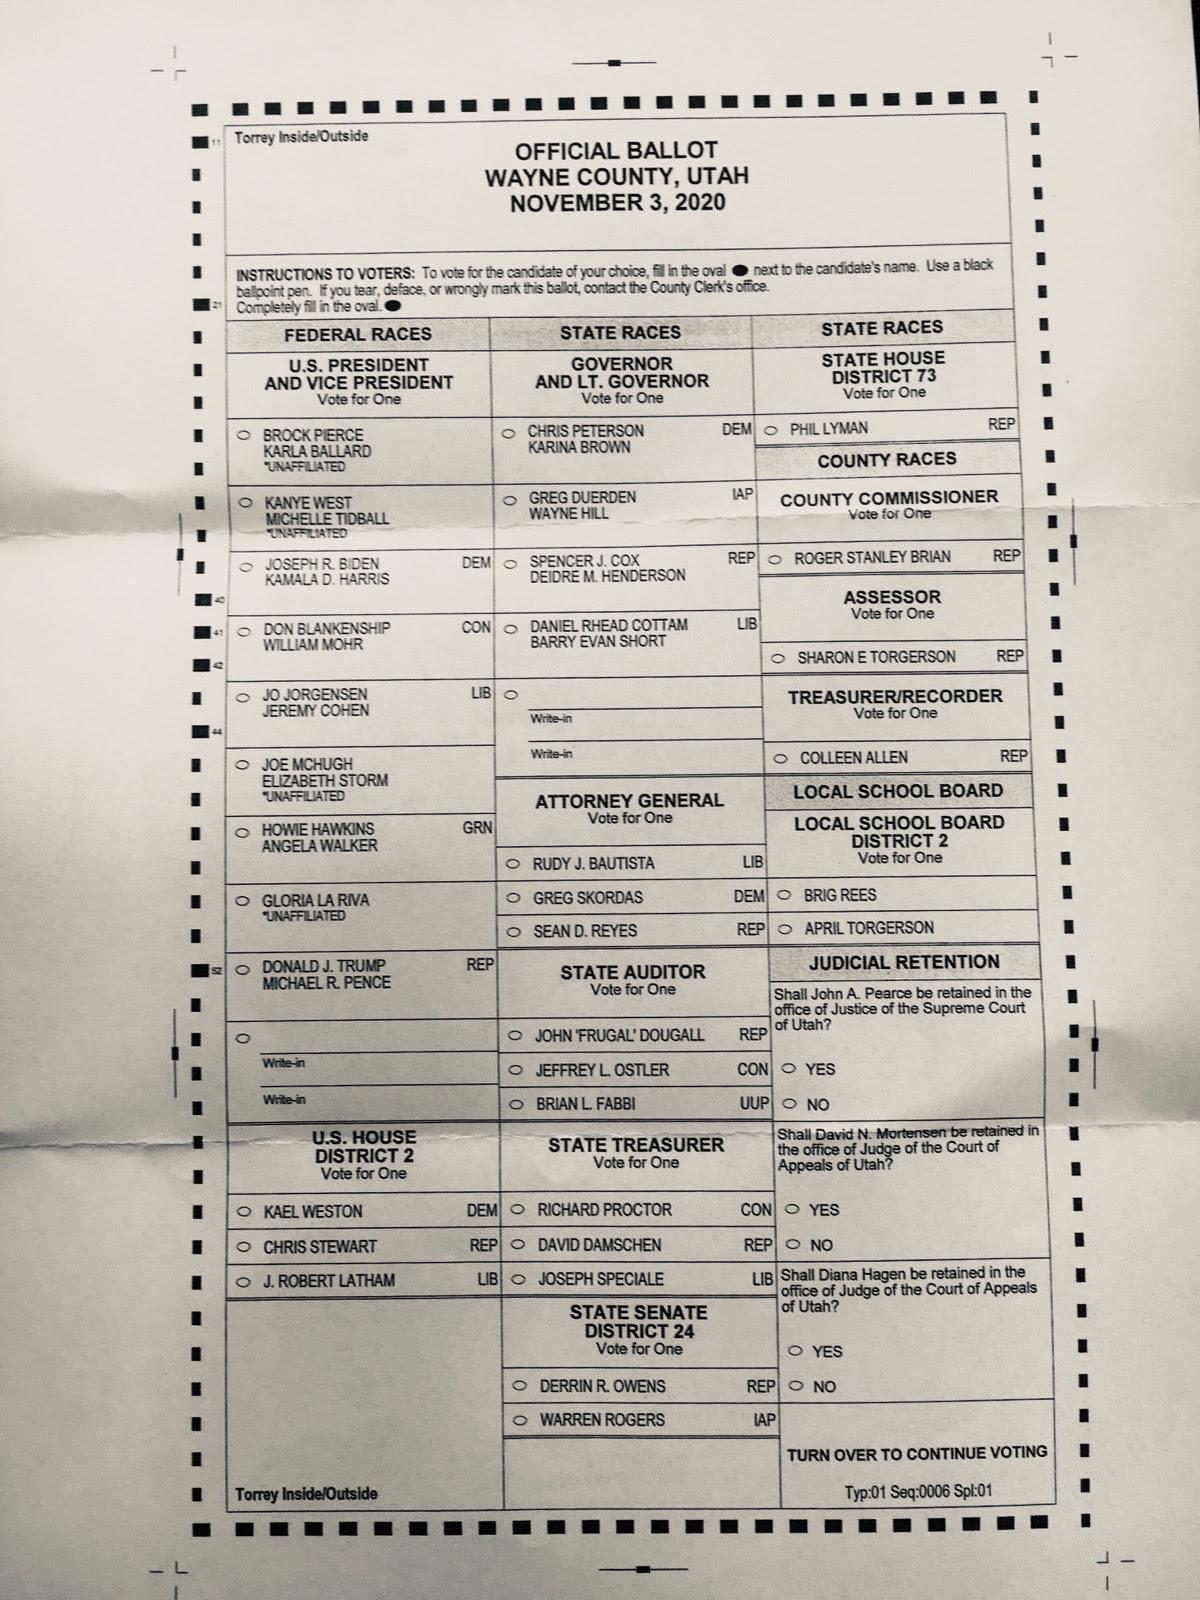 Wayne County sample ballot